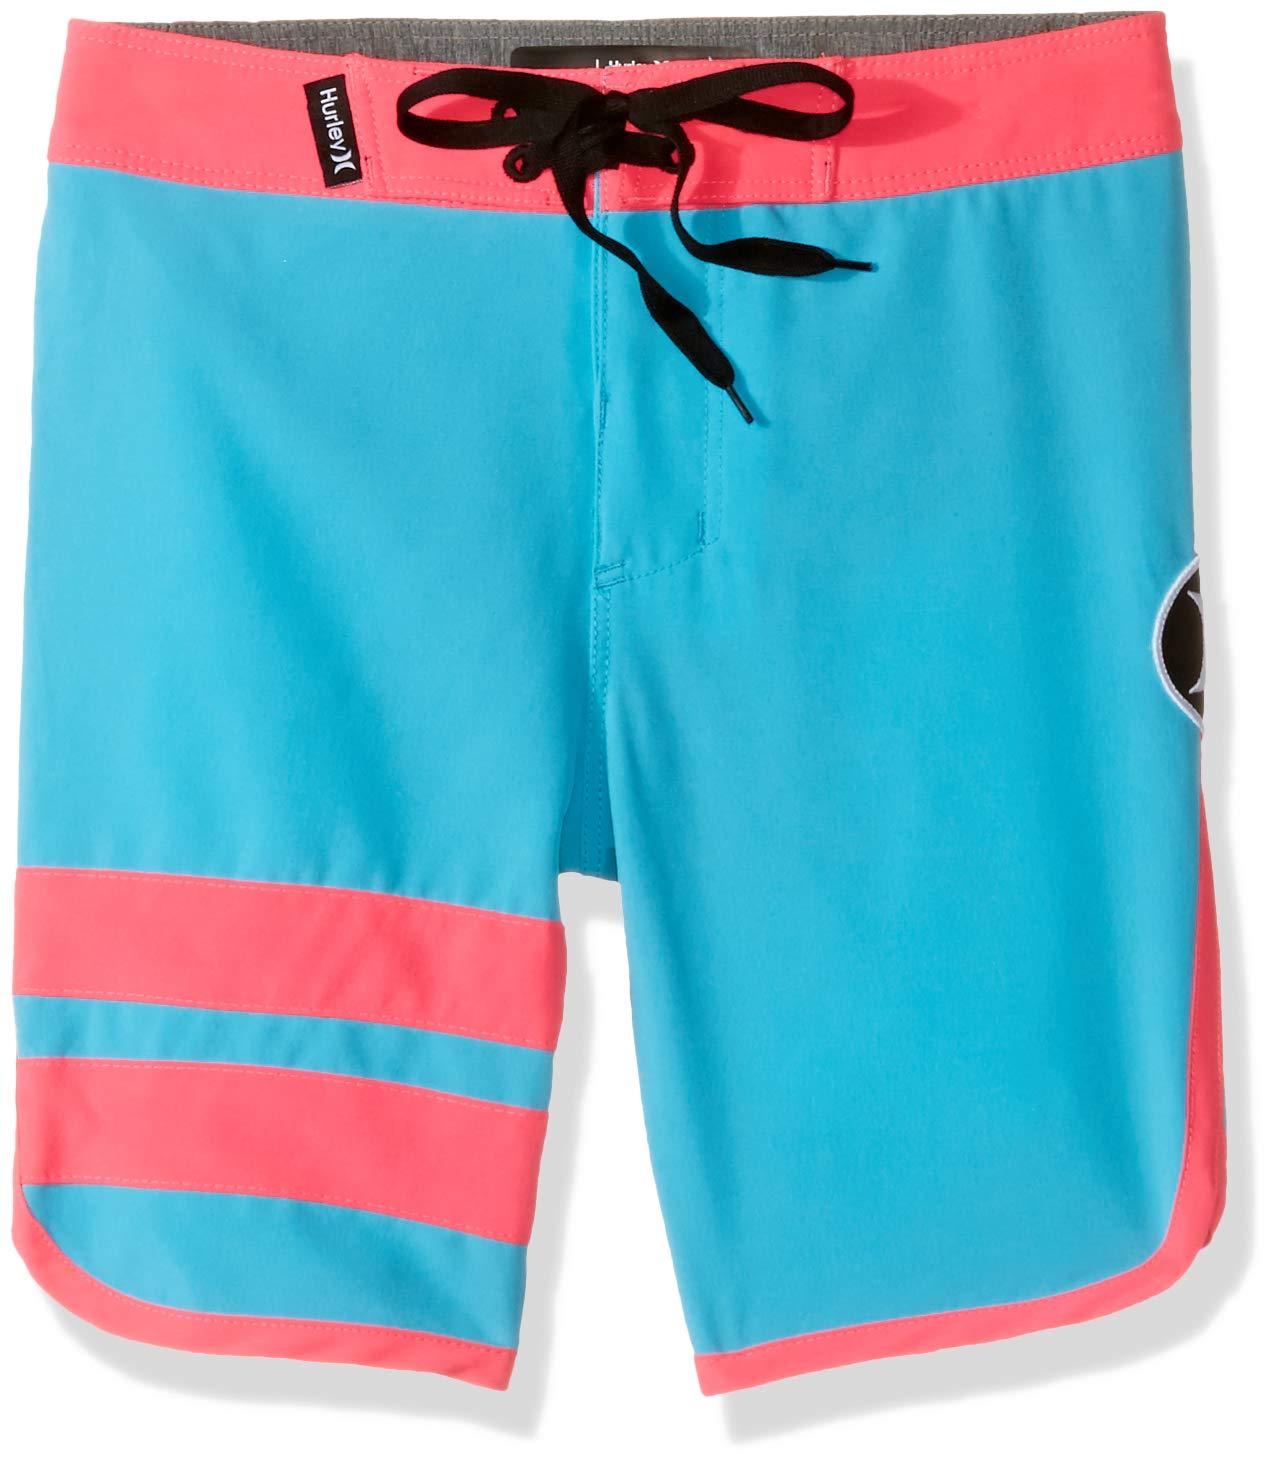 Hurley Little Boys' Block Party Boardshort, Chlorine Blue/Pink, 7